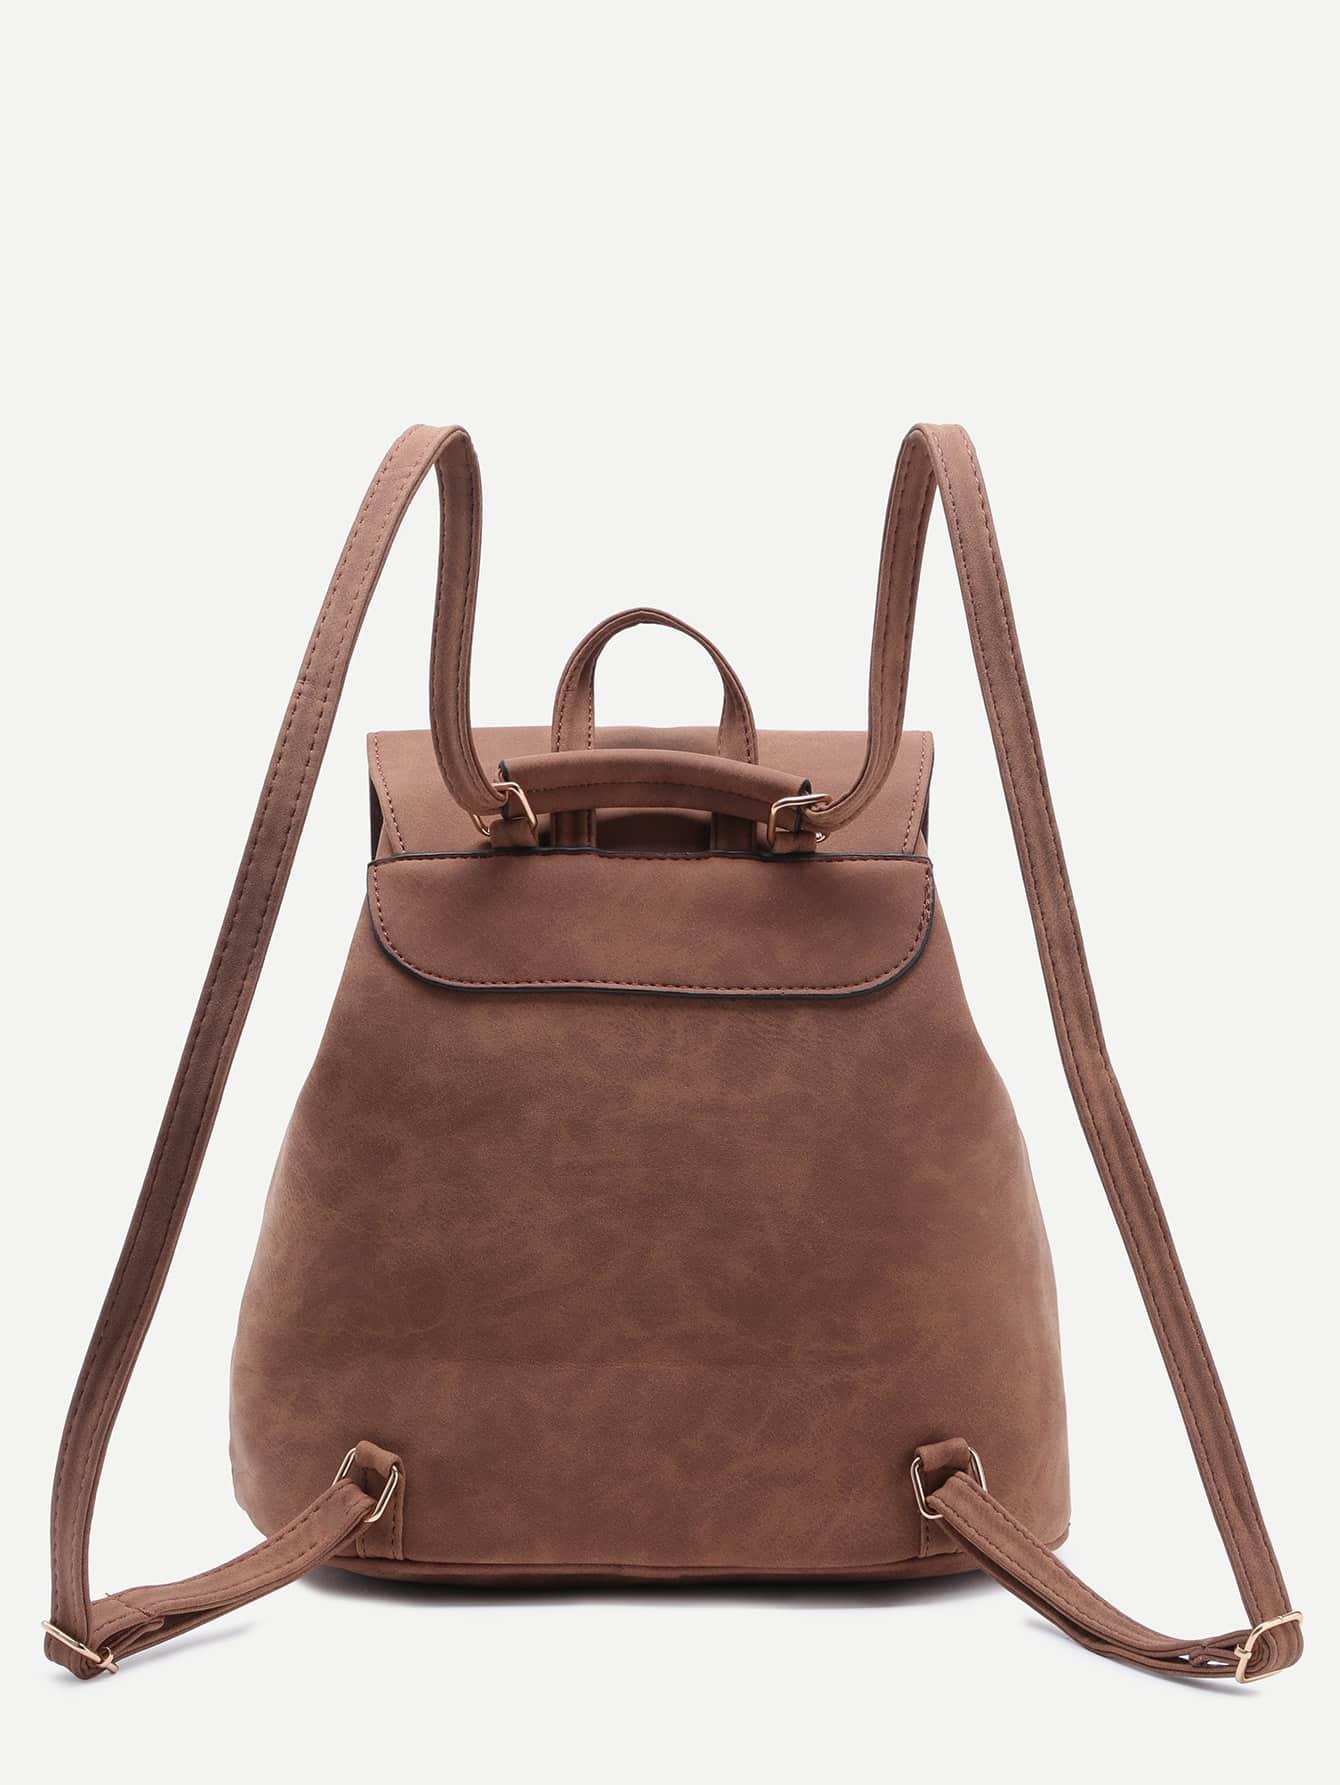 bag161013017_2